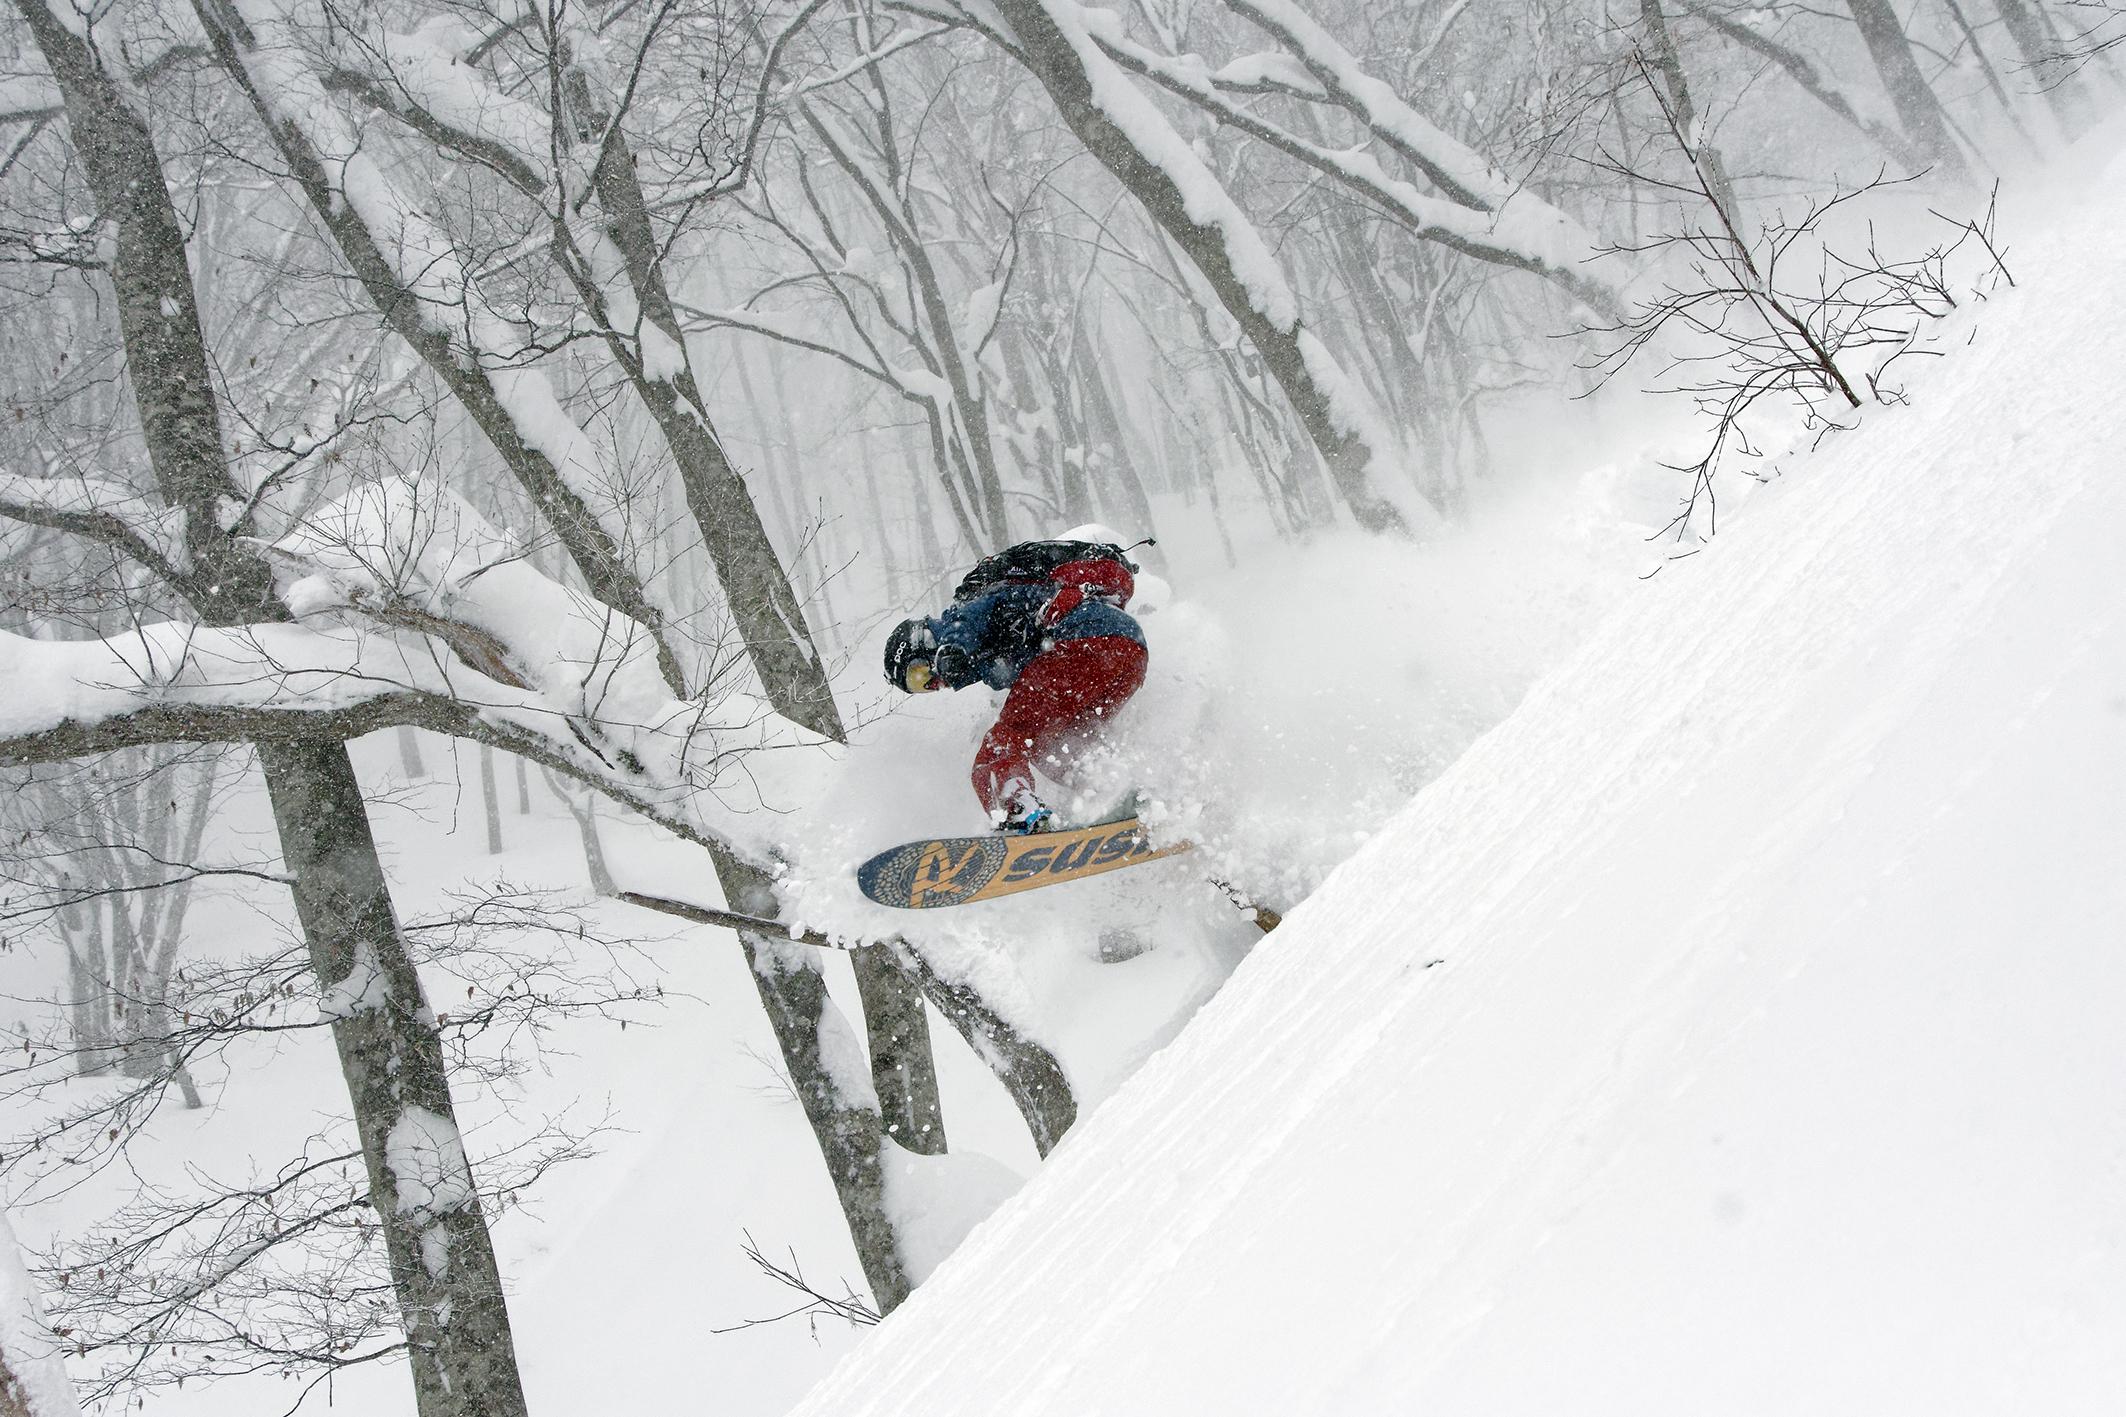 snowboard revolution glissejpg